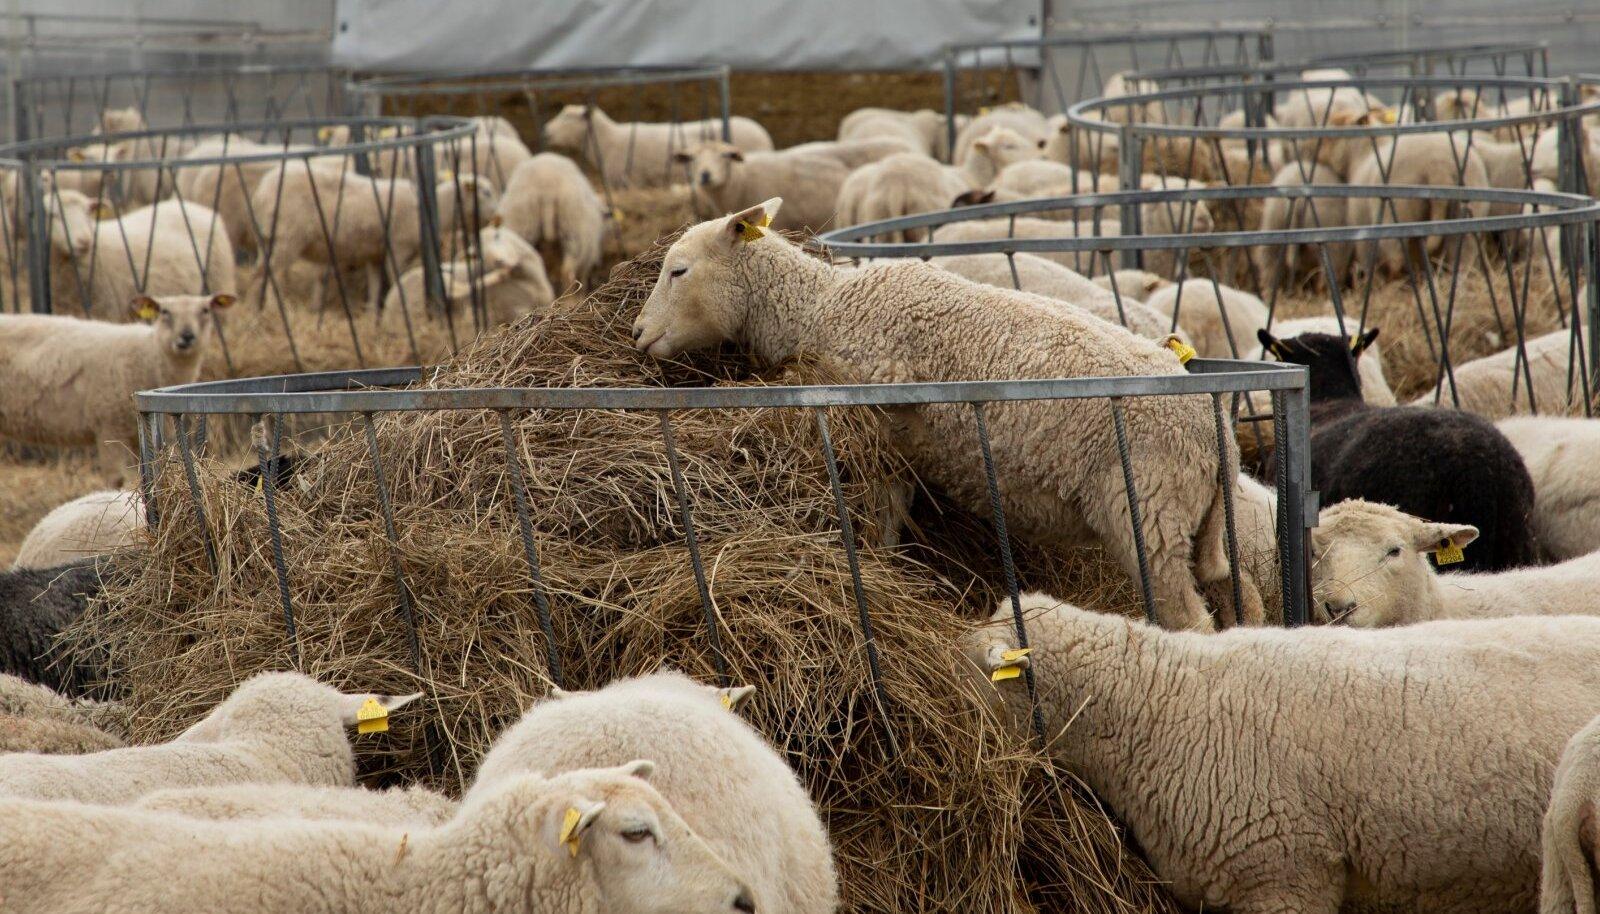 OÜ Kopra KarjamõisOÜ Kopra Karjamõis, lambad